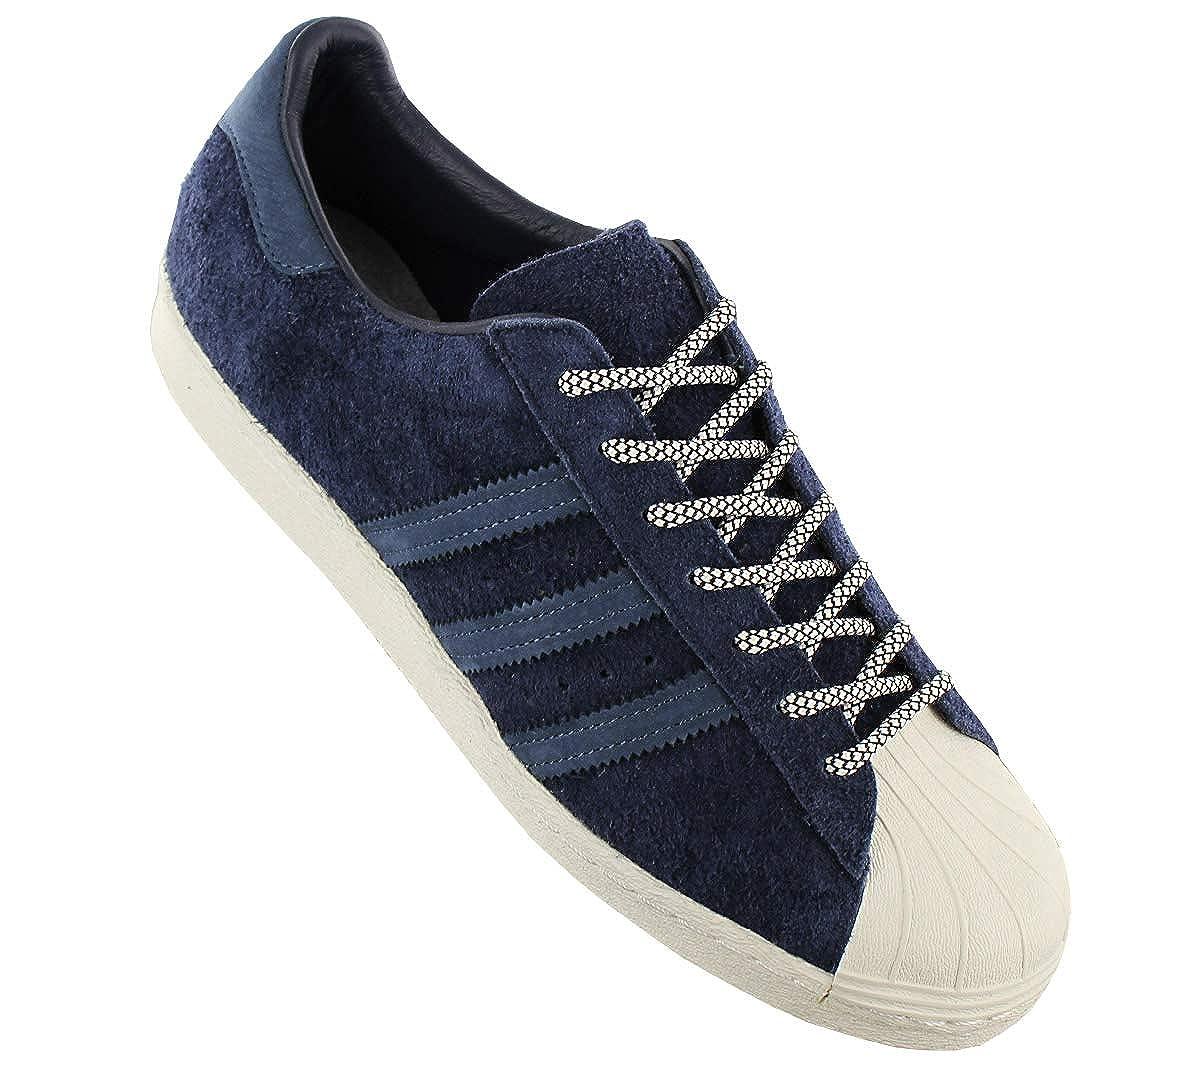 adidas Superstar 80S Schuhe Blau S76639